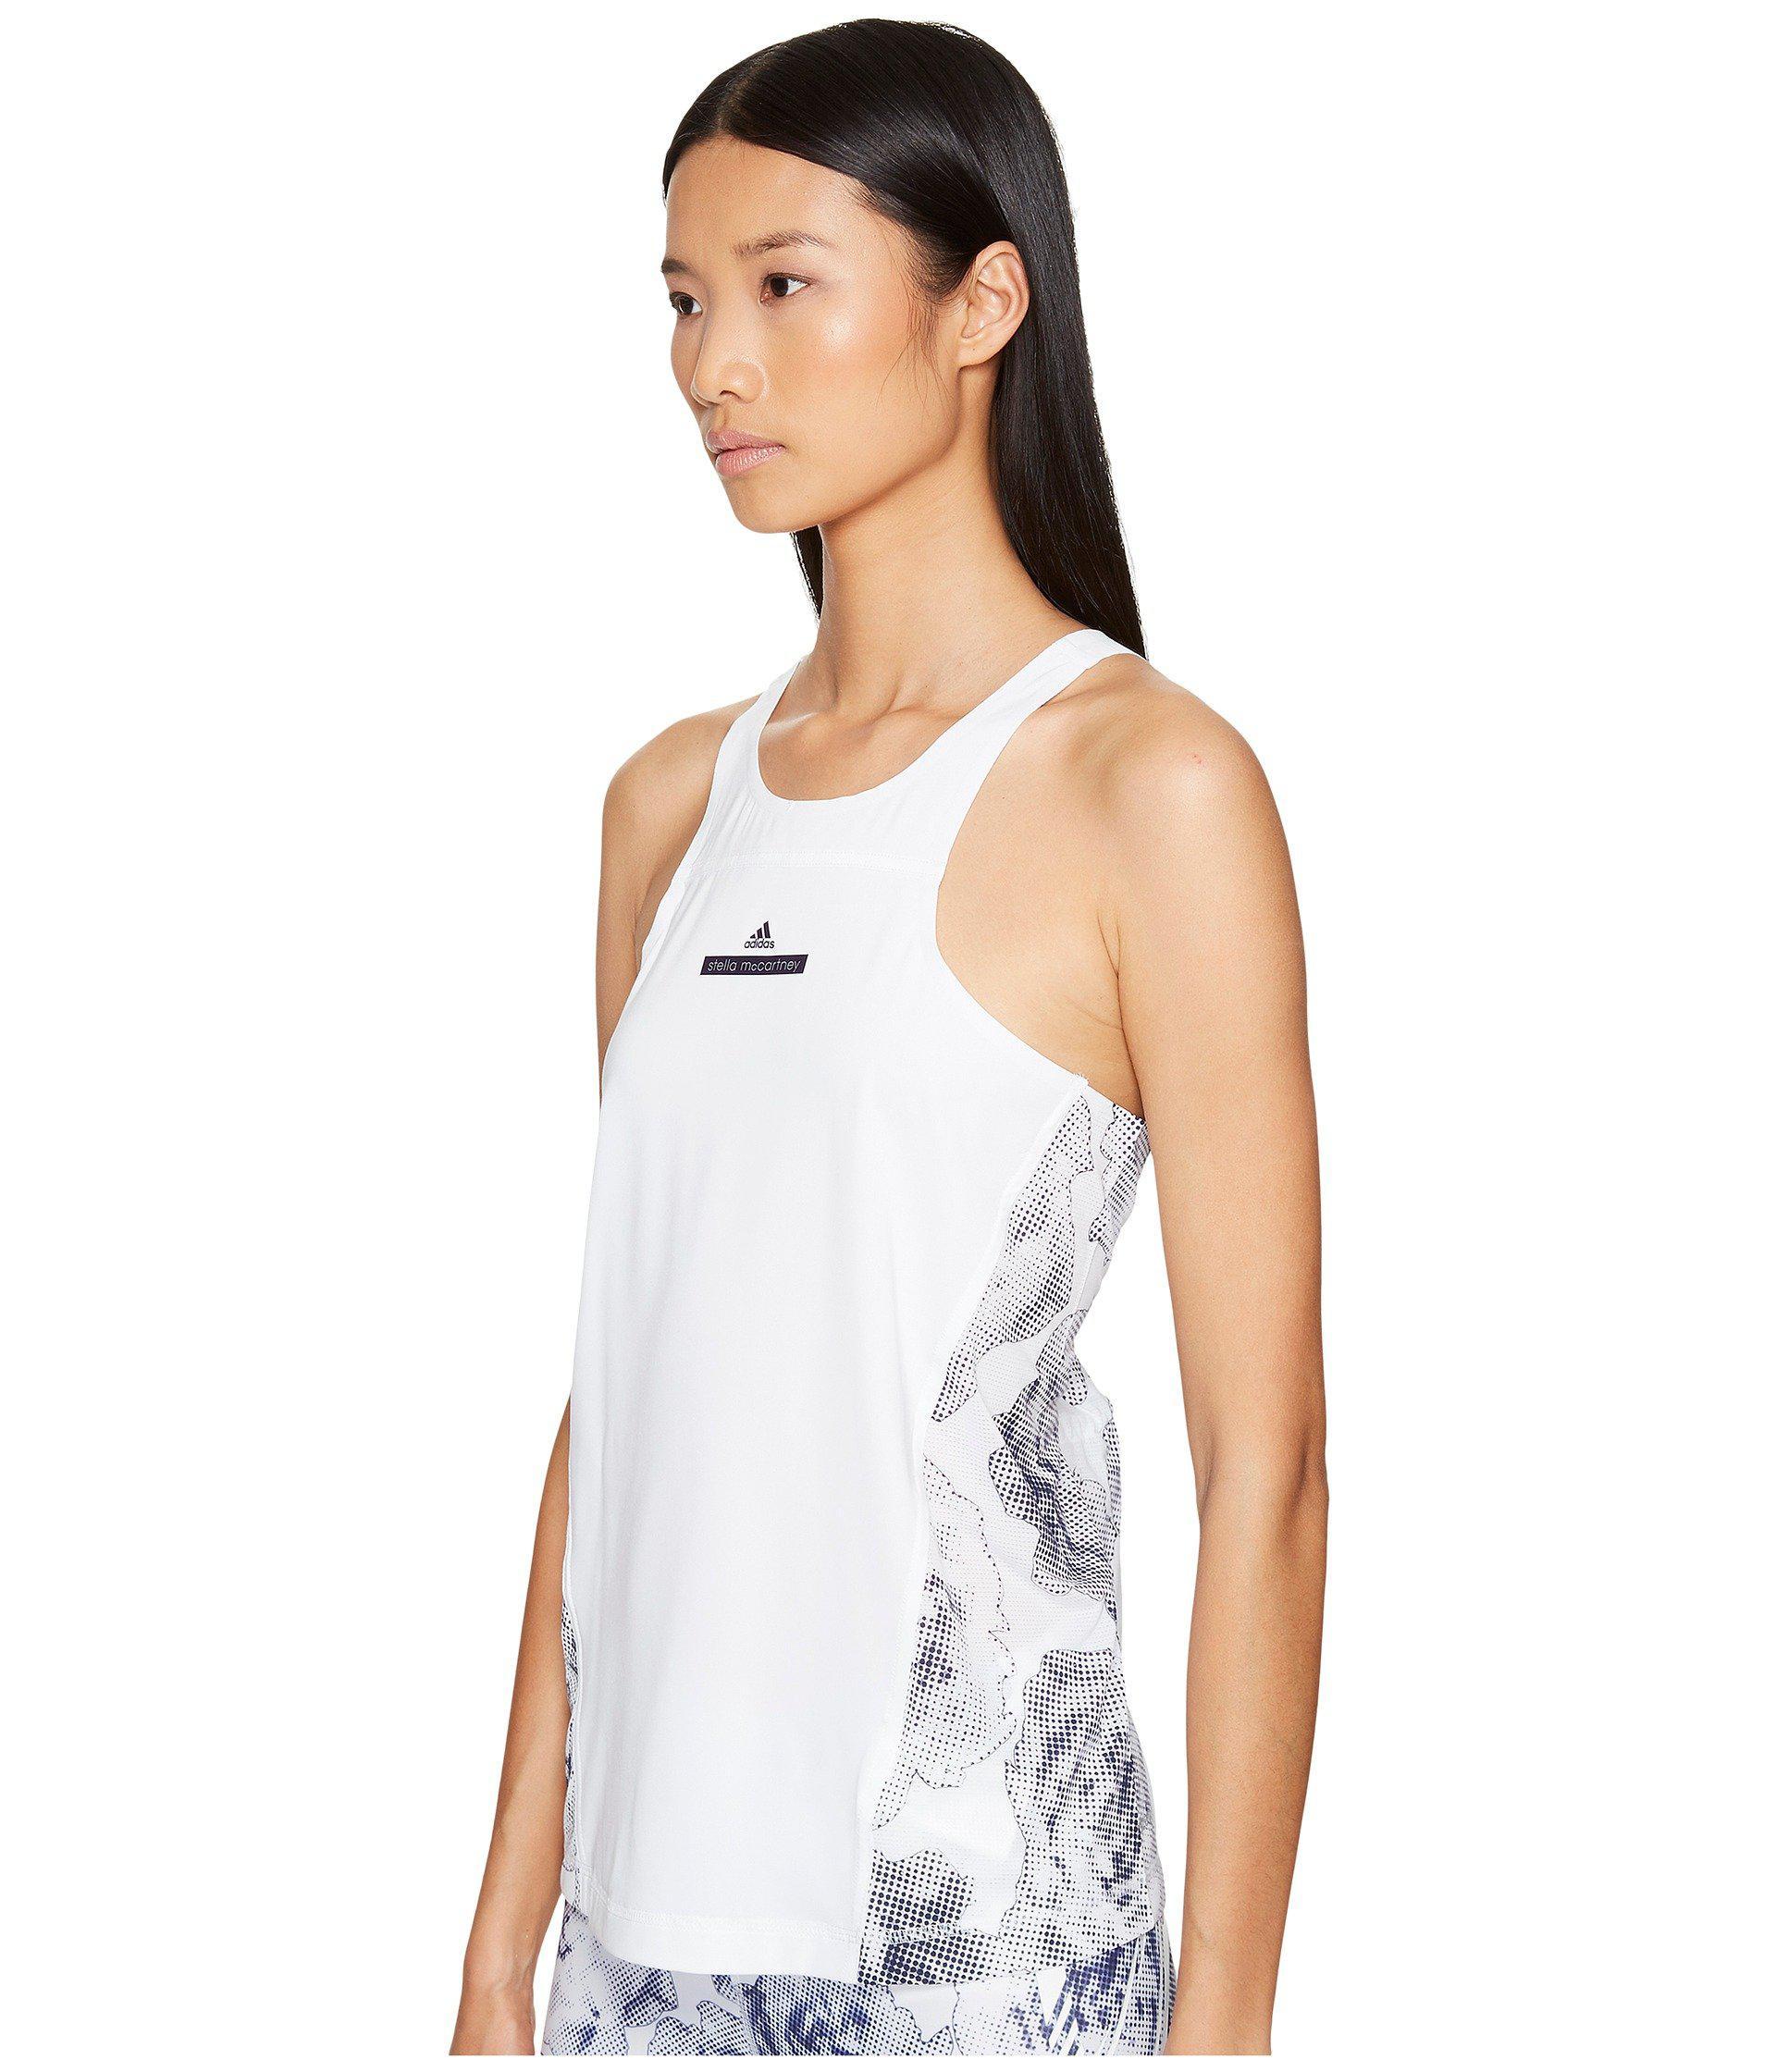 0809cf9f9f676 Lyst - adidas By Stella McCartney White Run Adizero Tank in White - Save 51%